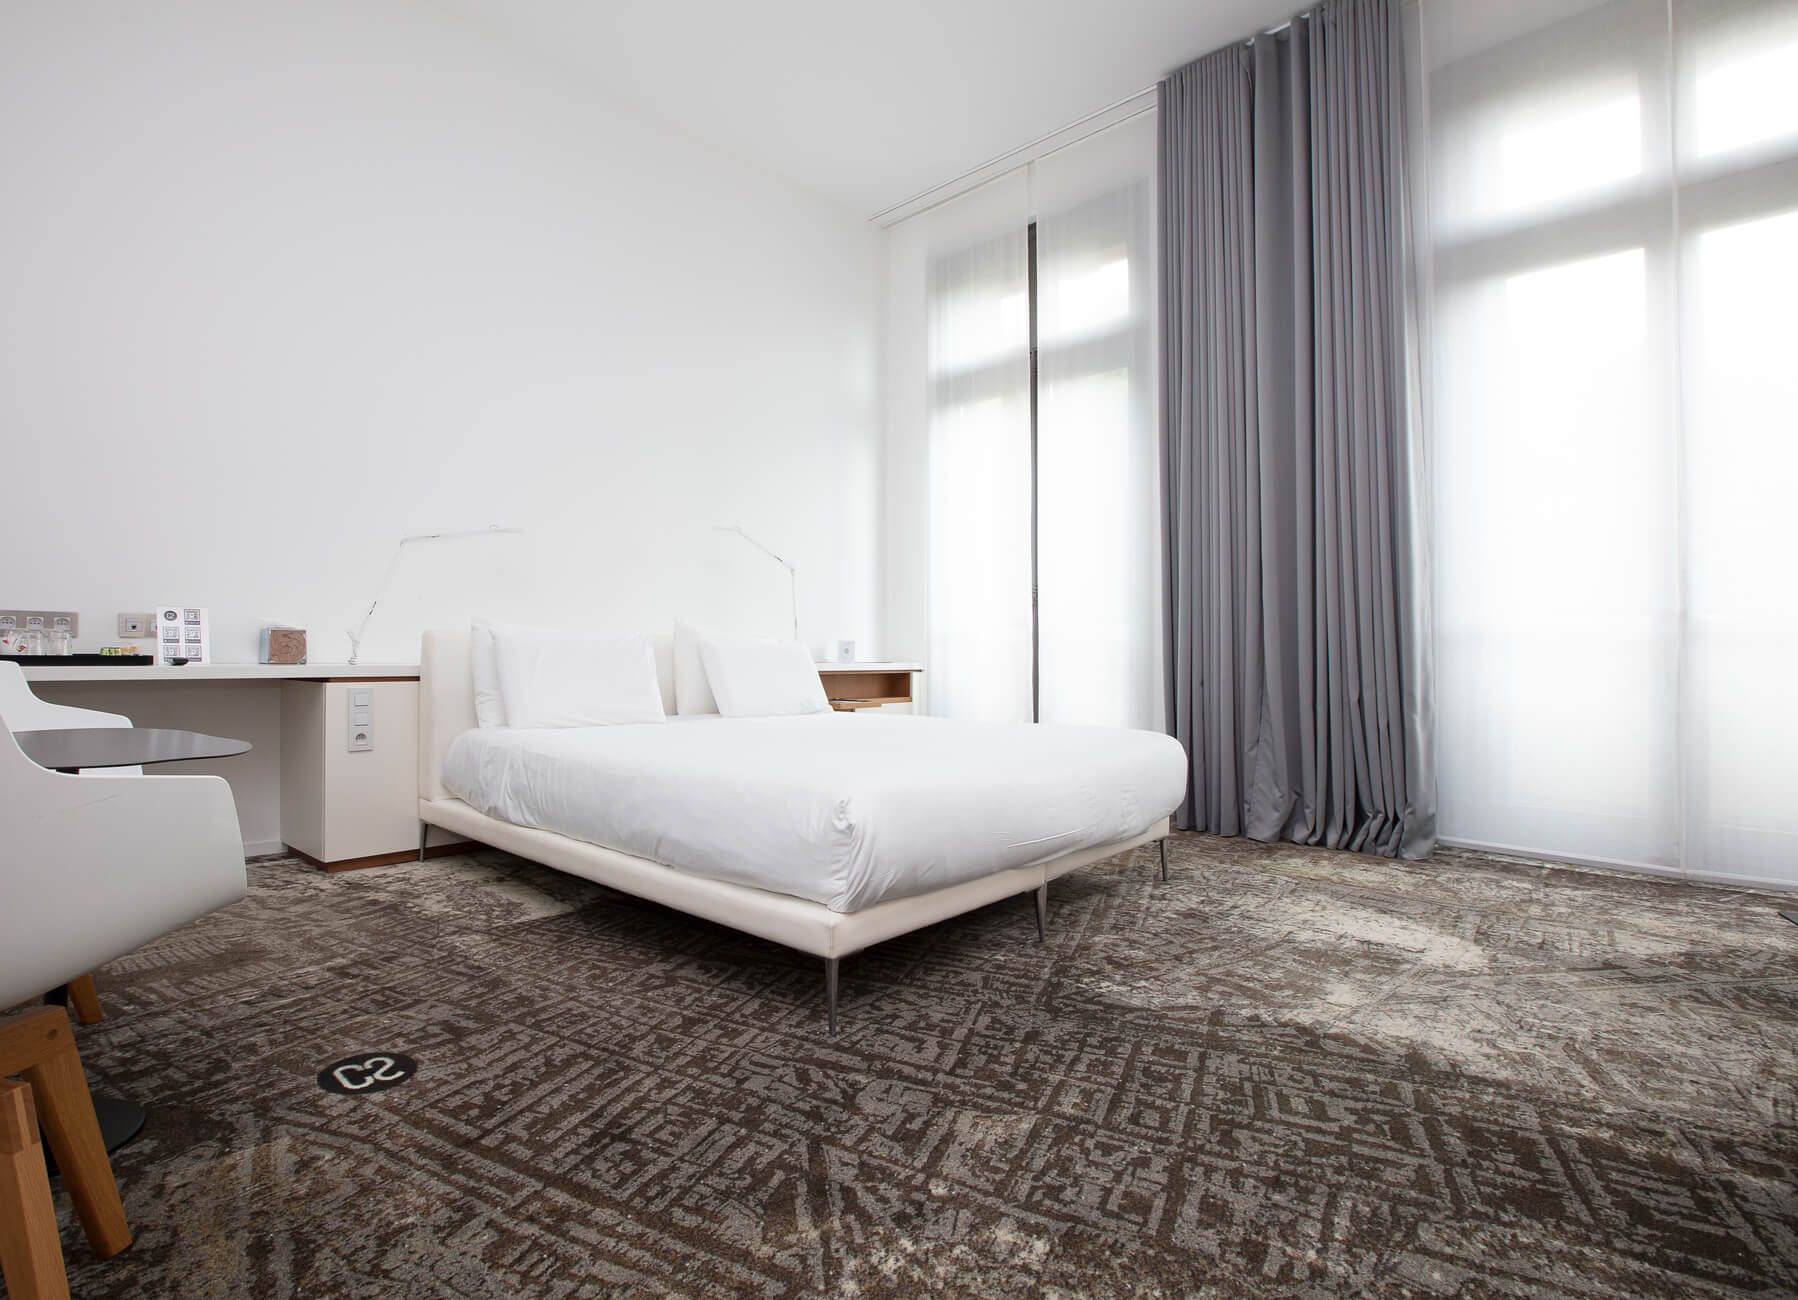 HIGHLINE-Hotel C2 Marseille-France-1